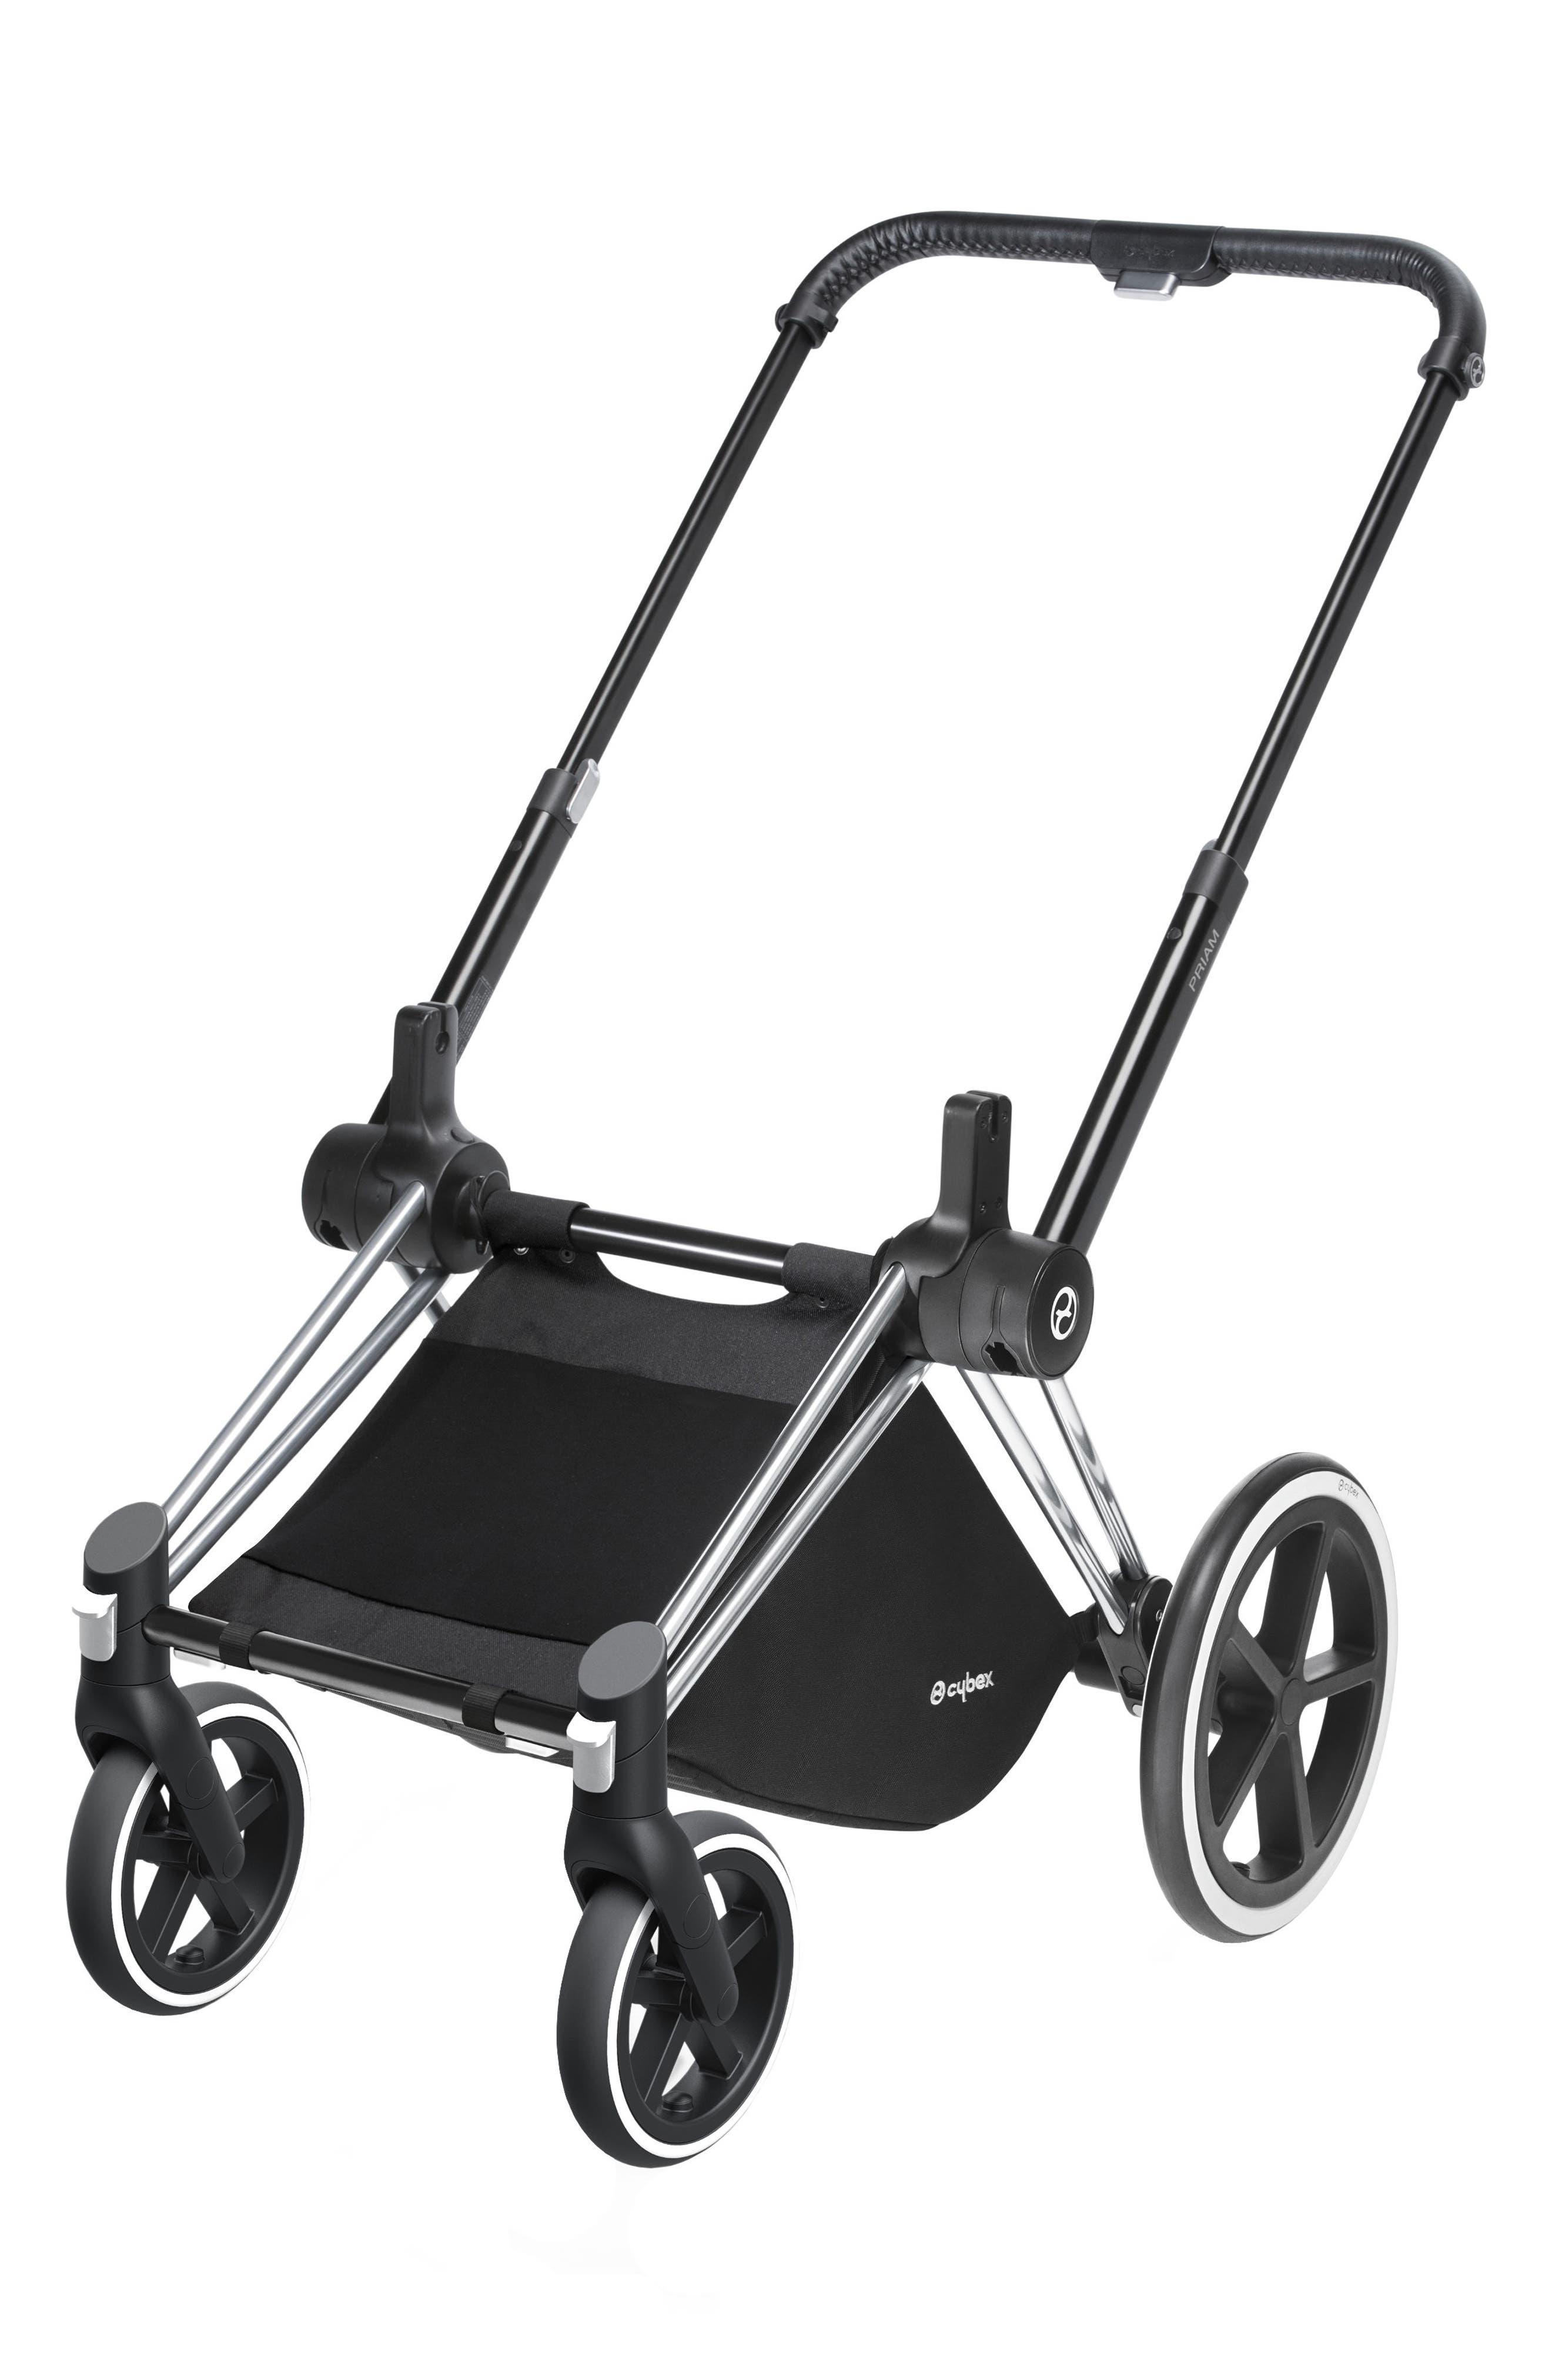 Main Image - CYBEX Priam Stroller Frame with Trekking Wheels